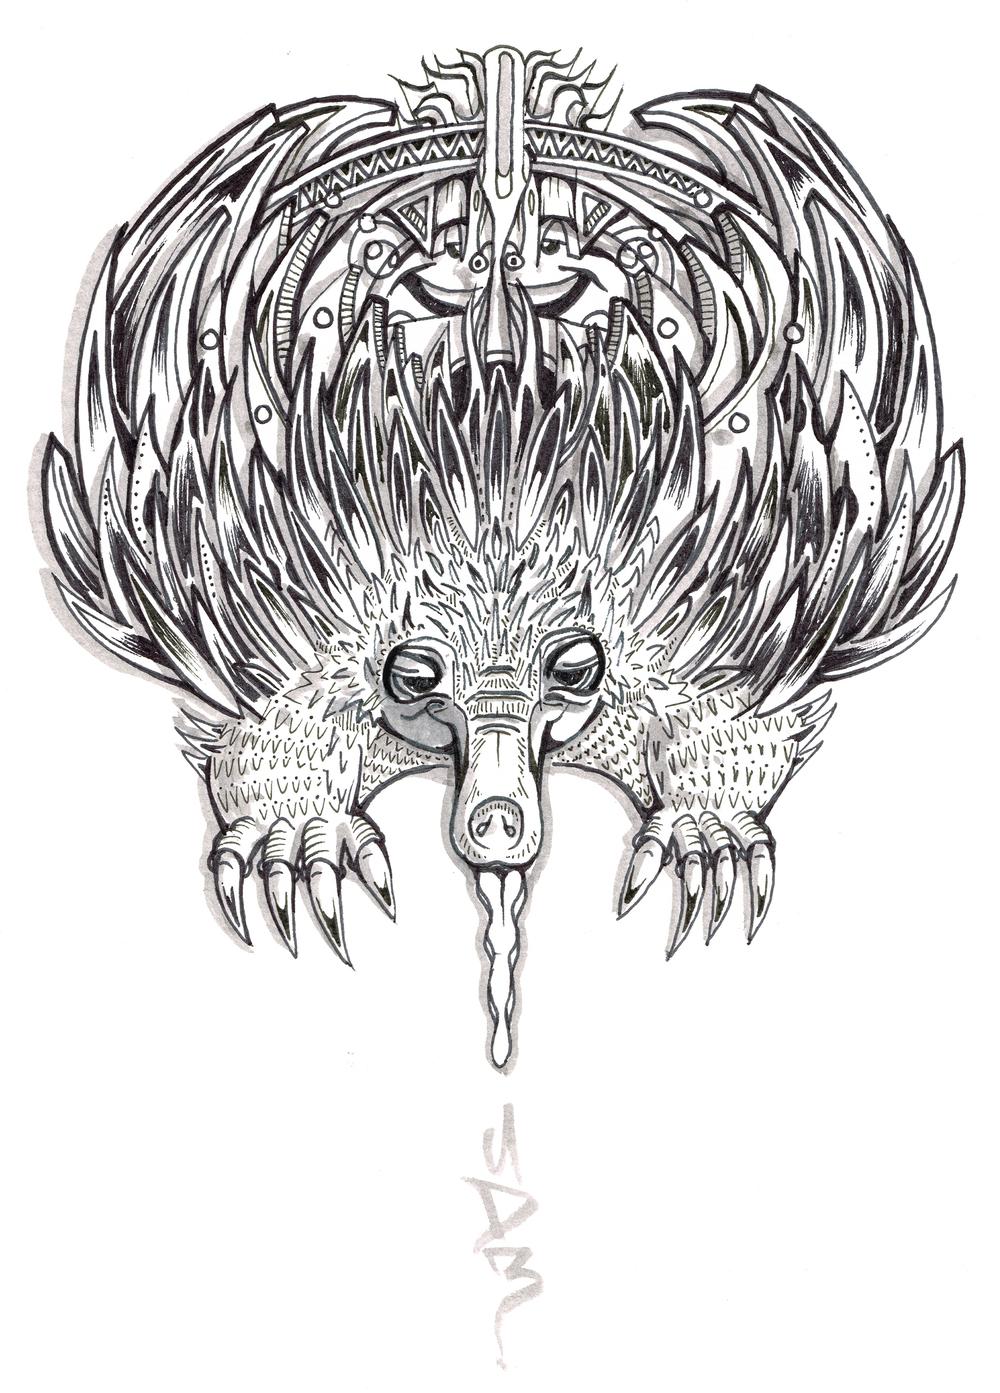 echidna drawing